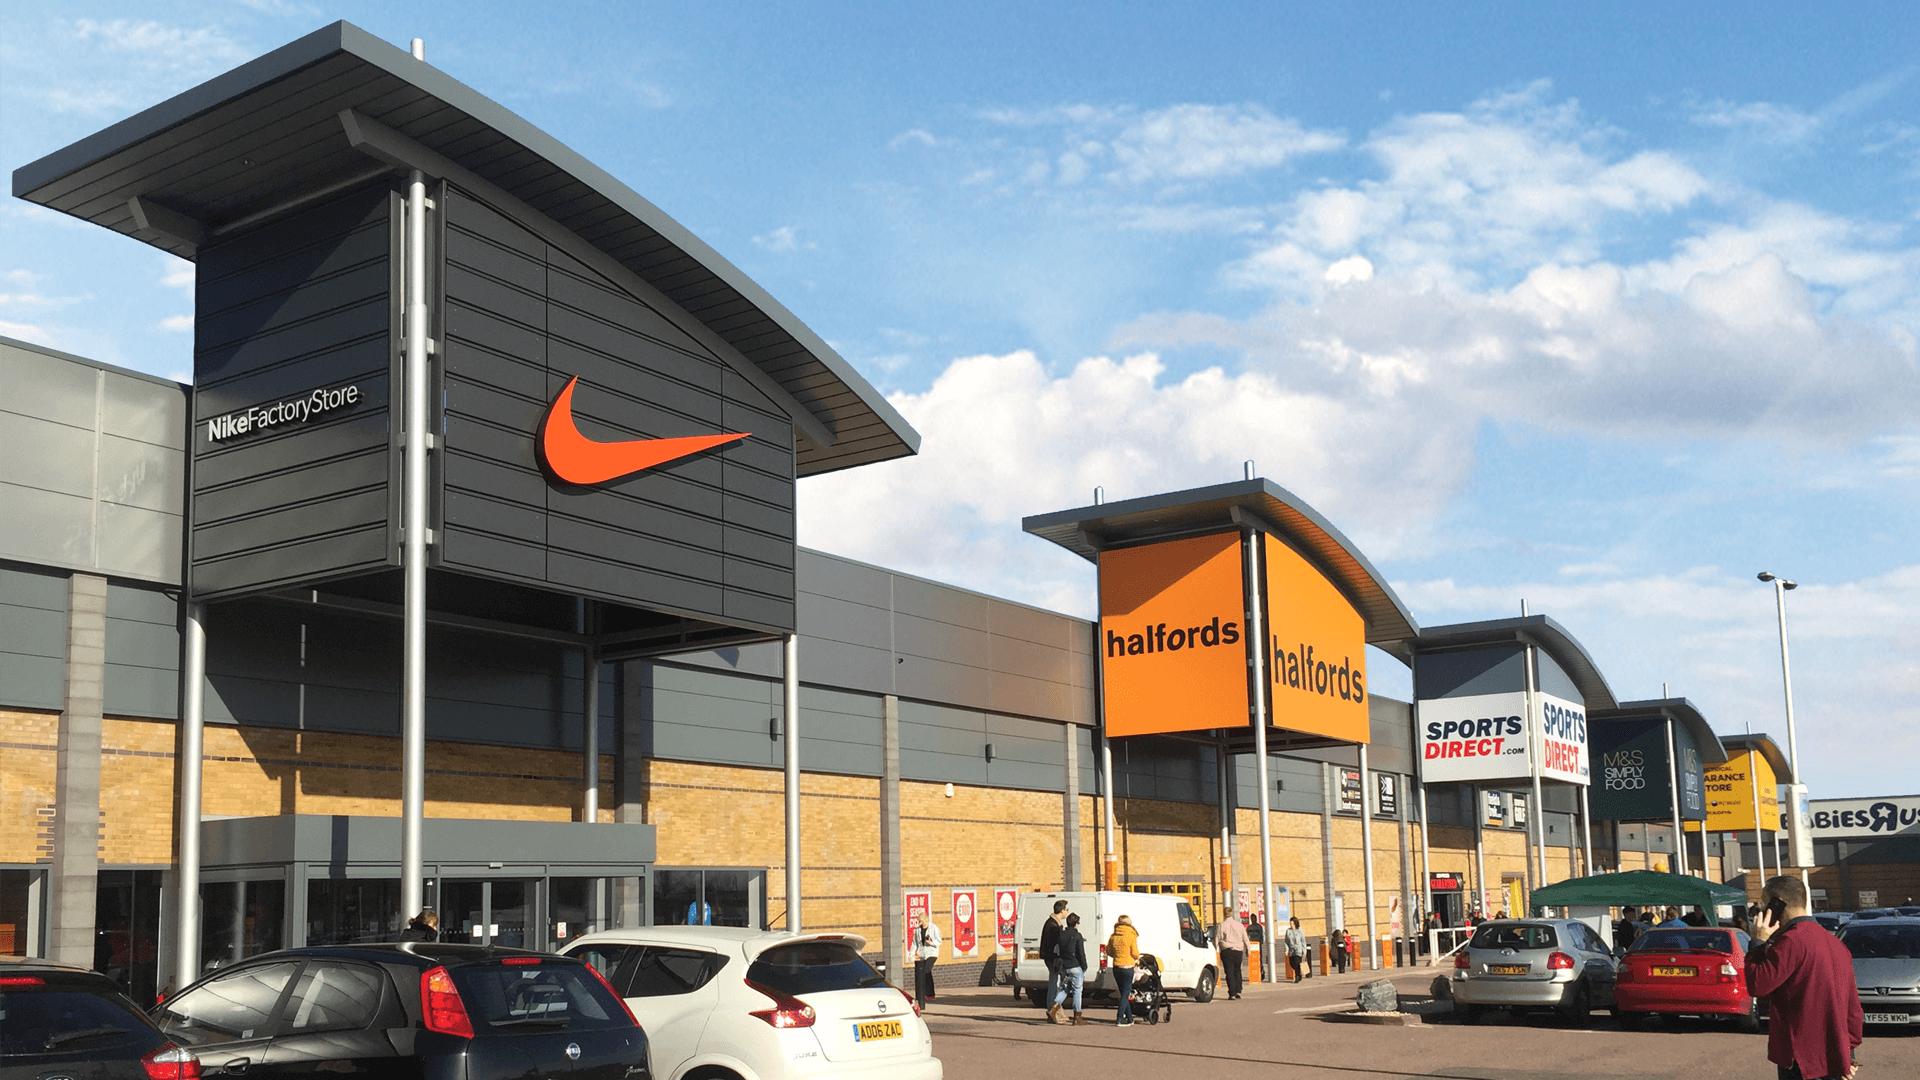 Enfield Retail Park, North London